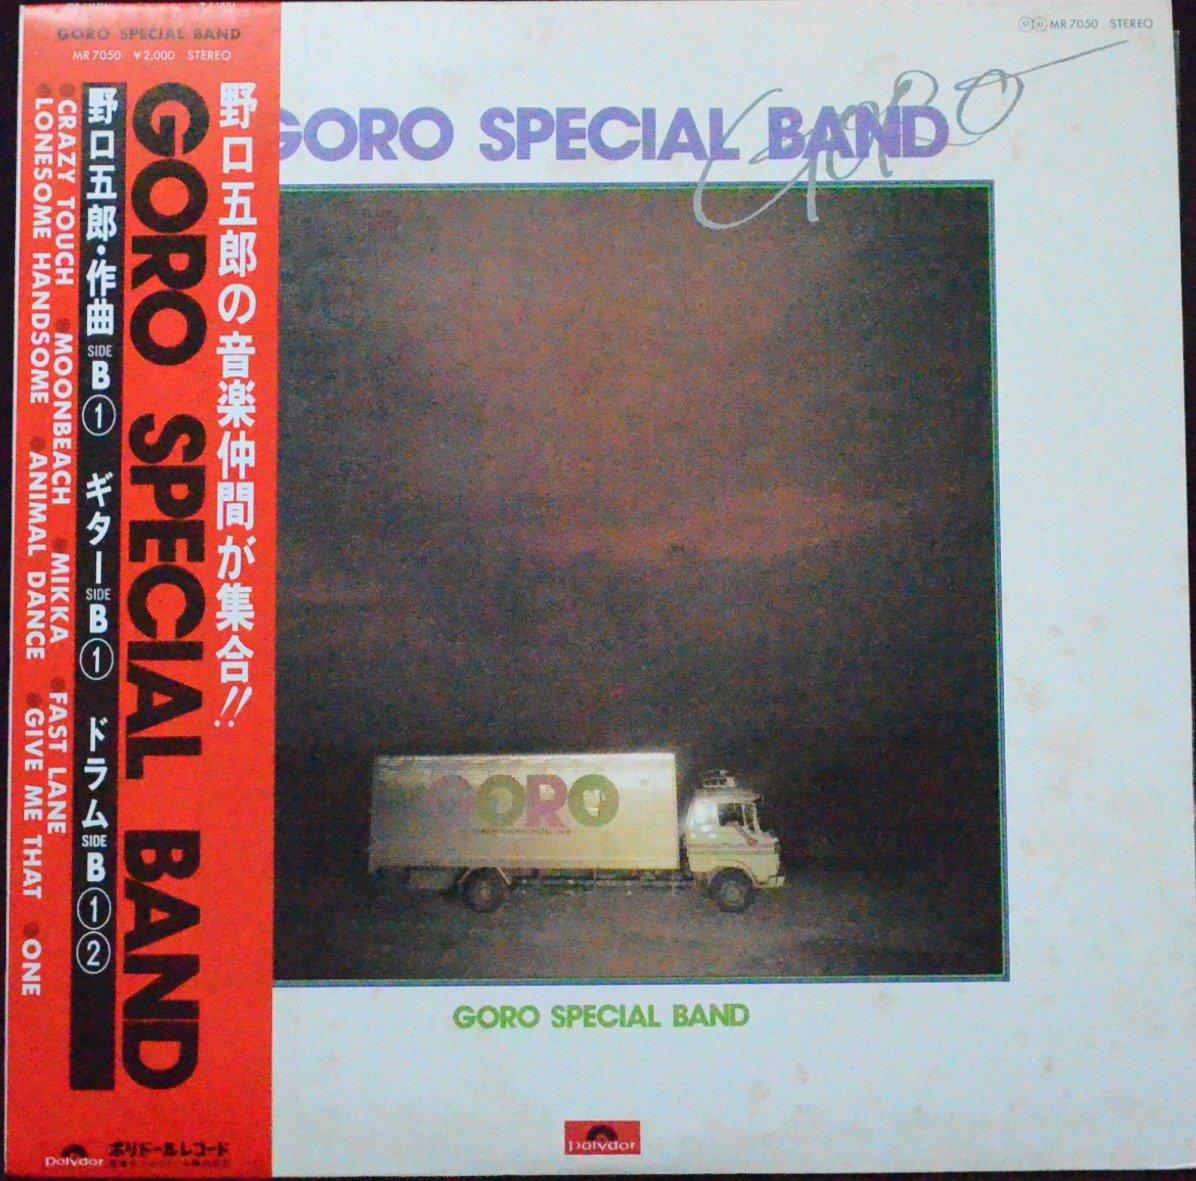 野口五郎 GORO NOGUCHI / GORO SPECIAL BAND (LP)